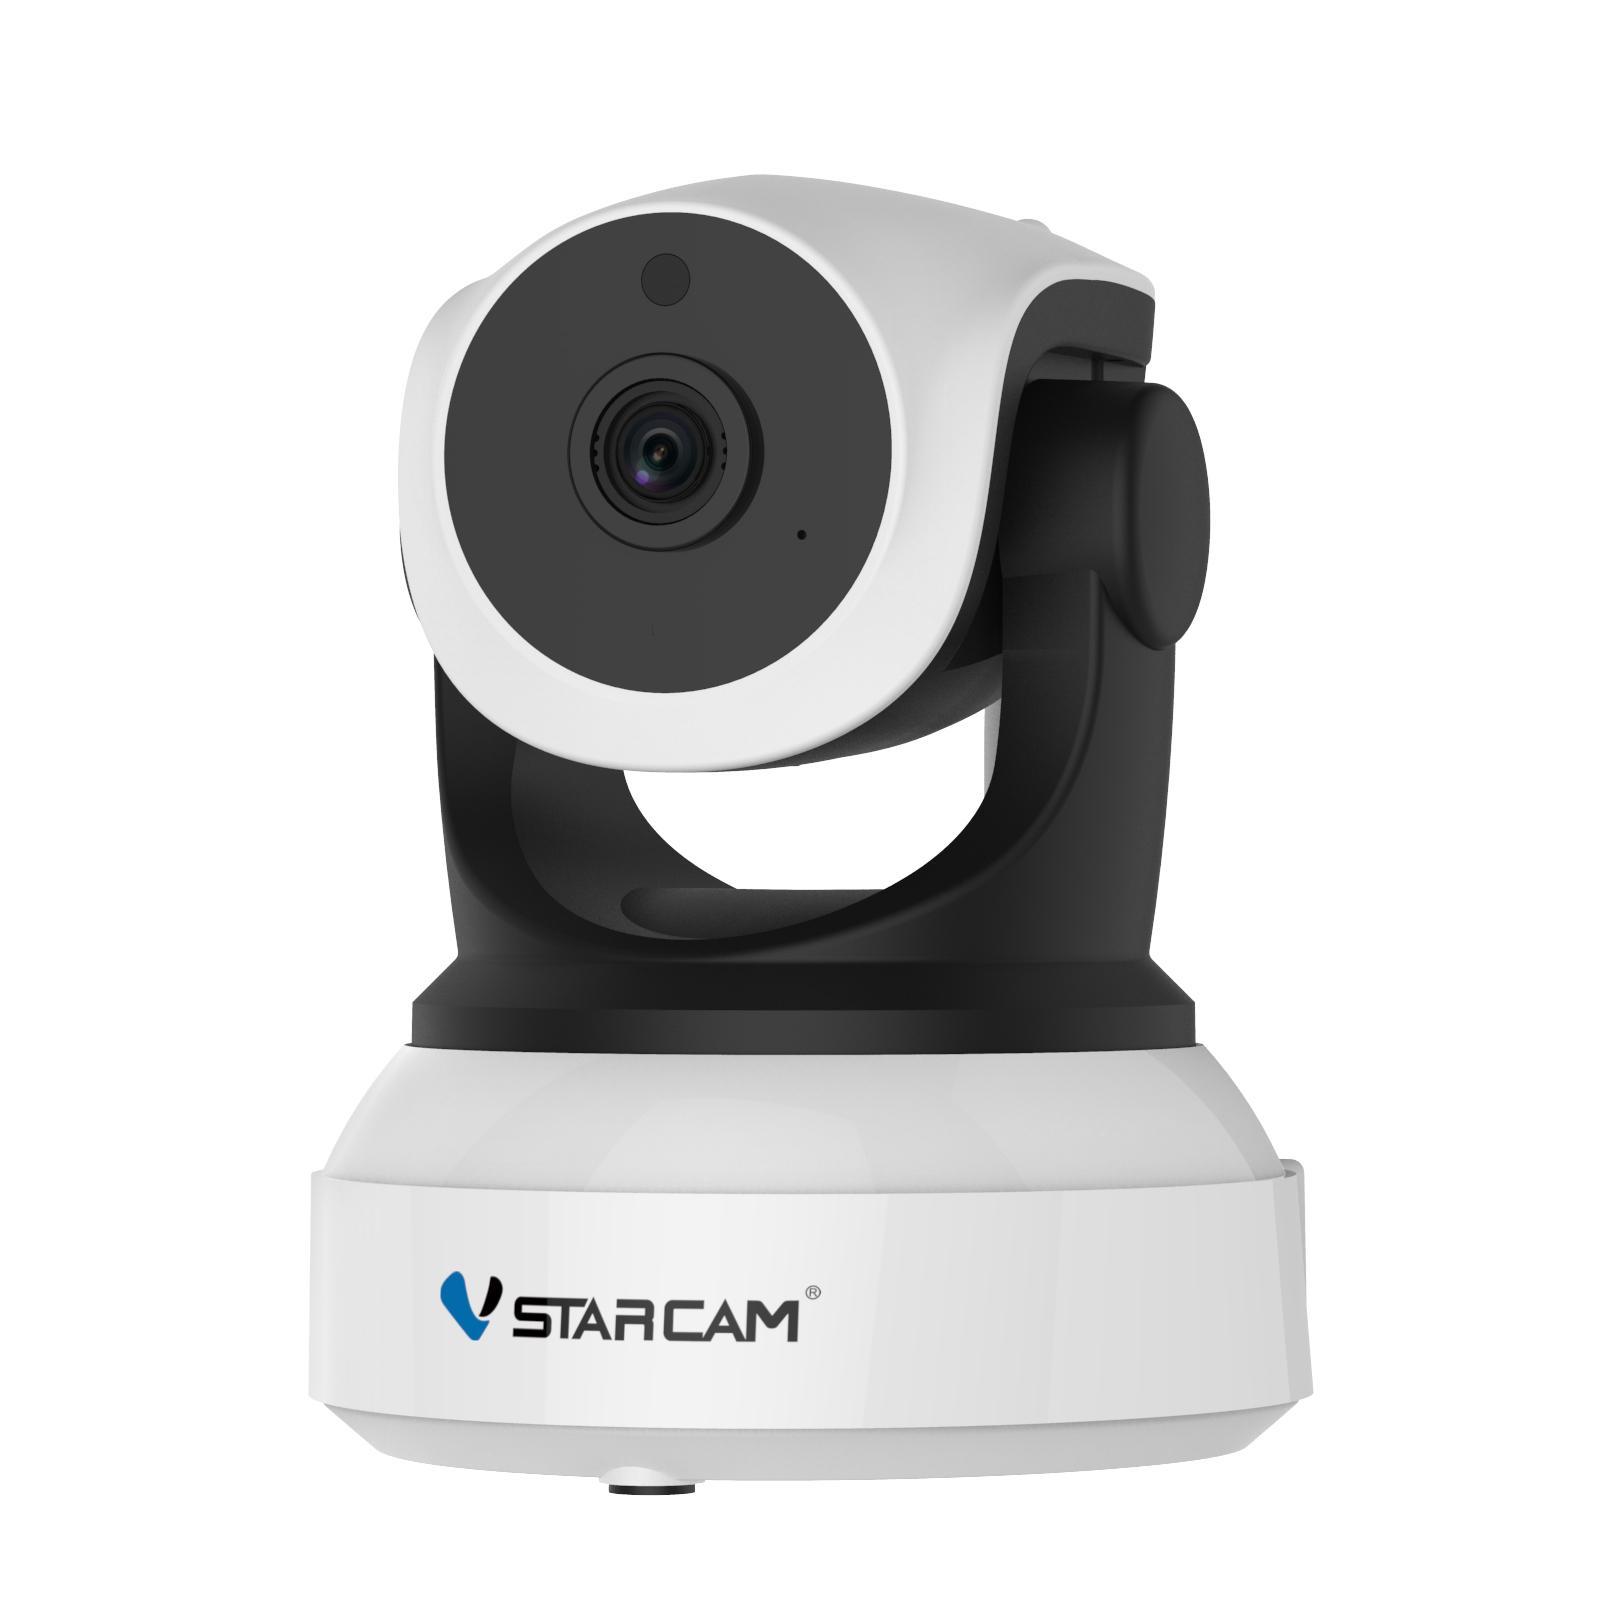 VStarcam C24S 200万像素网络摄像机 2